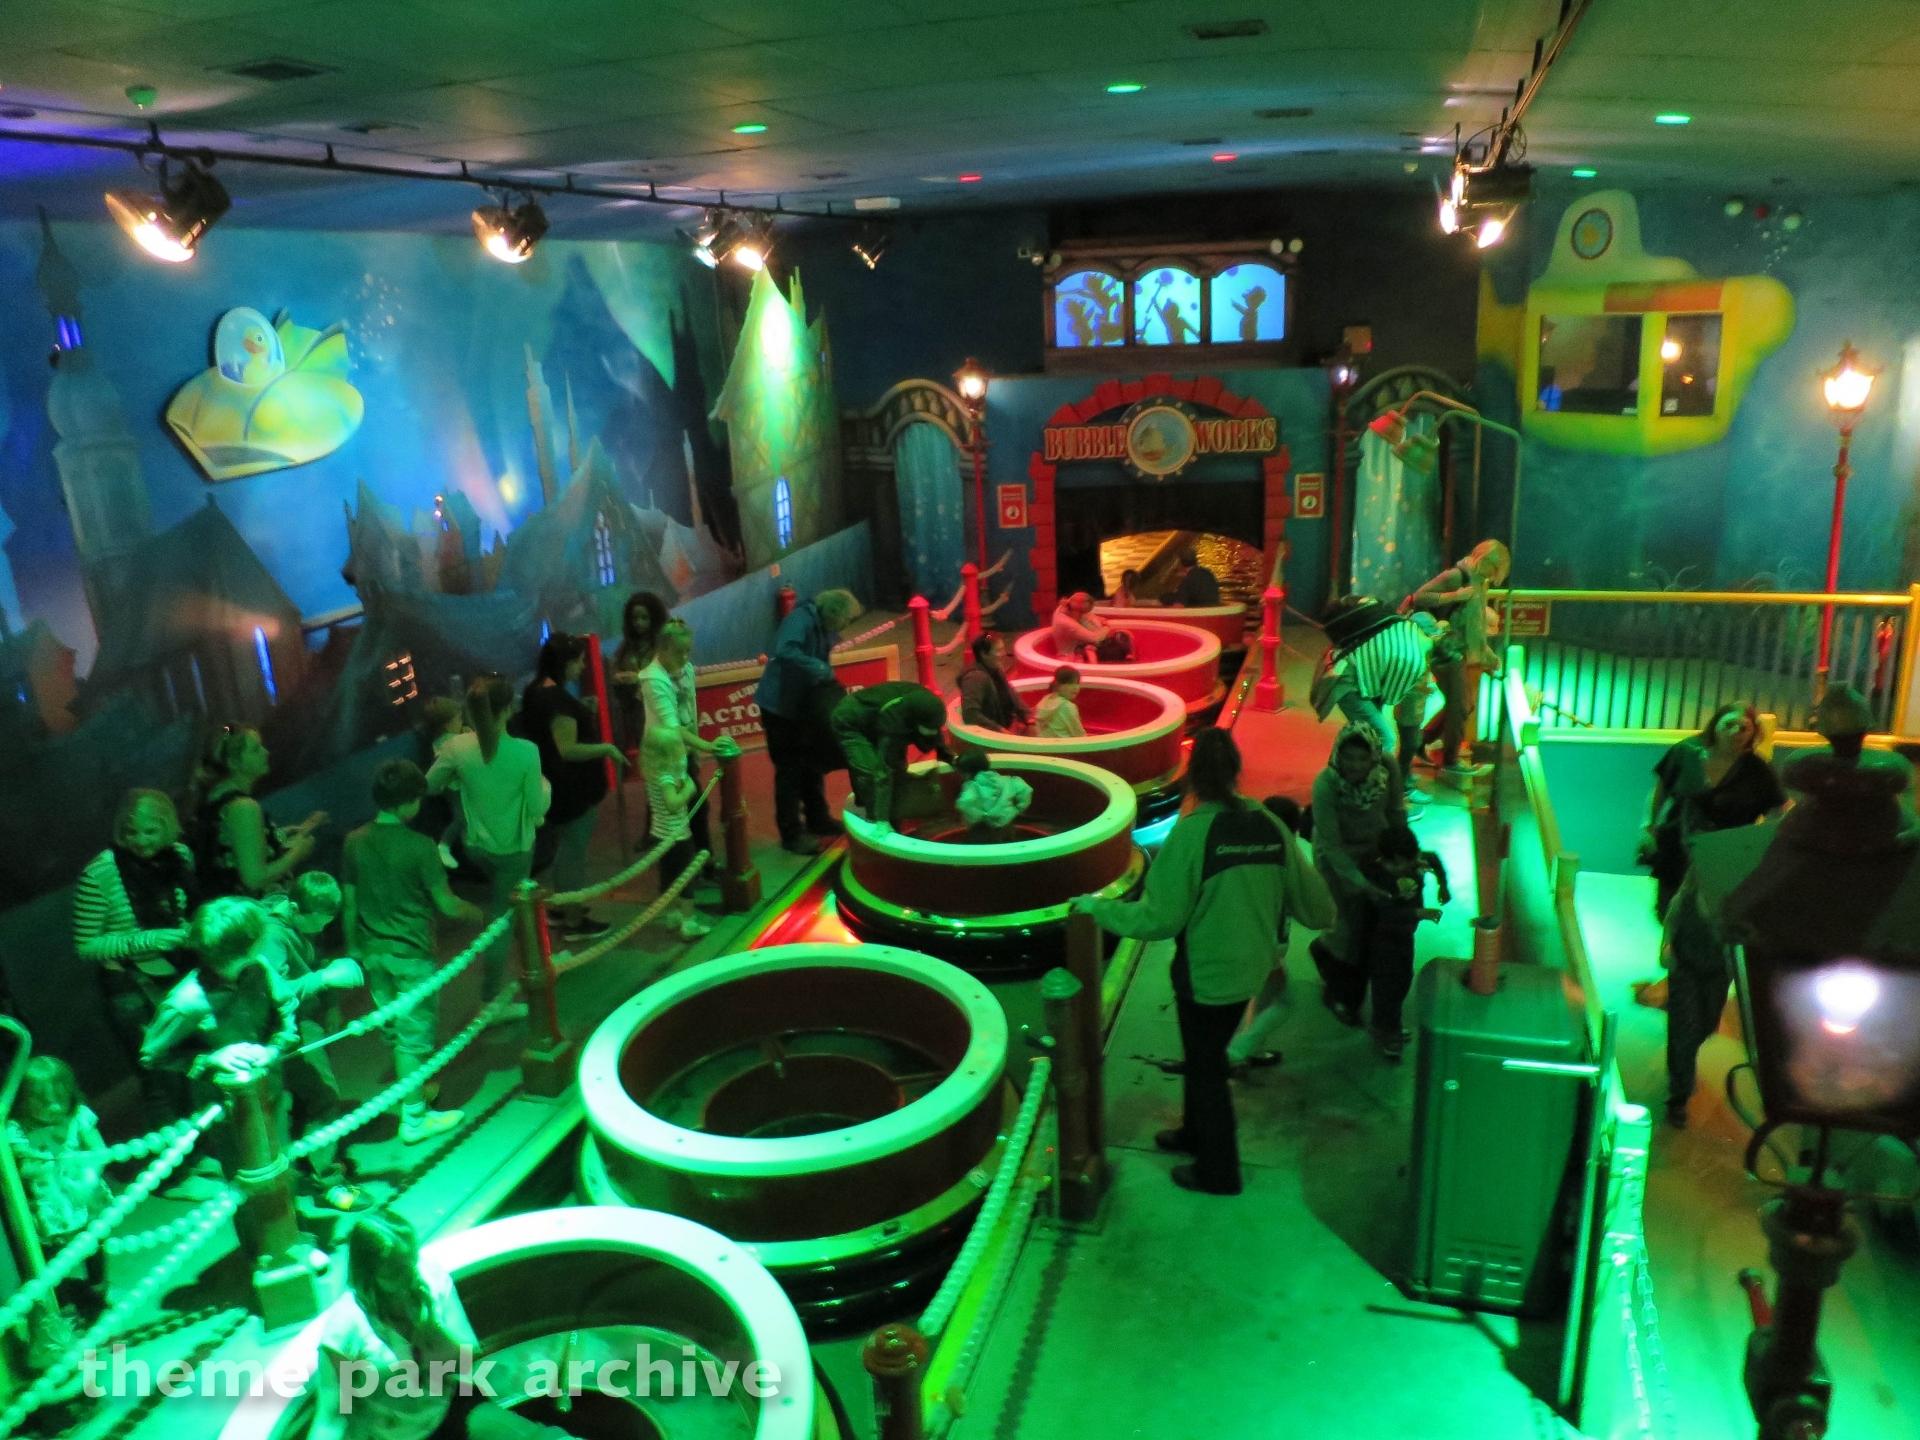 Bubbleworks at Chessington World of Adventures Resort